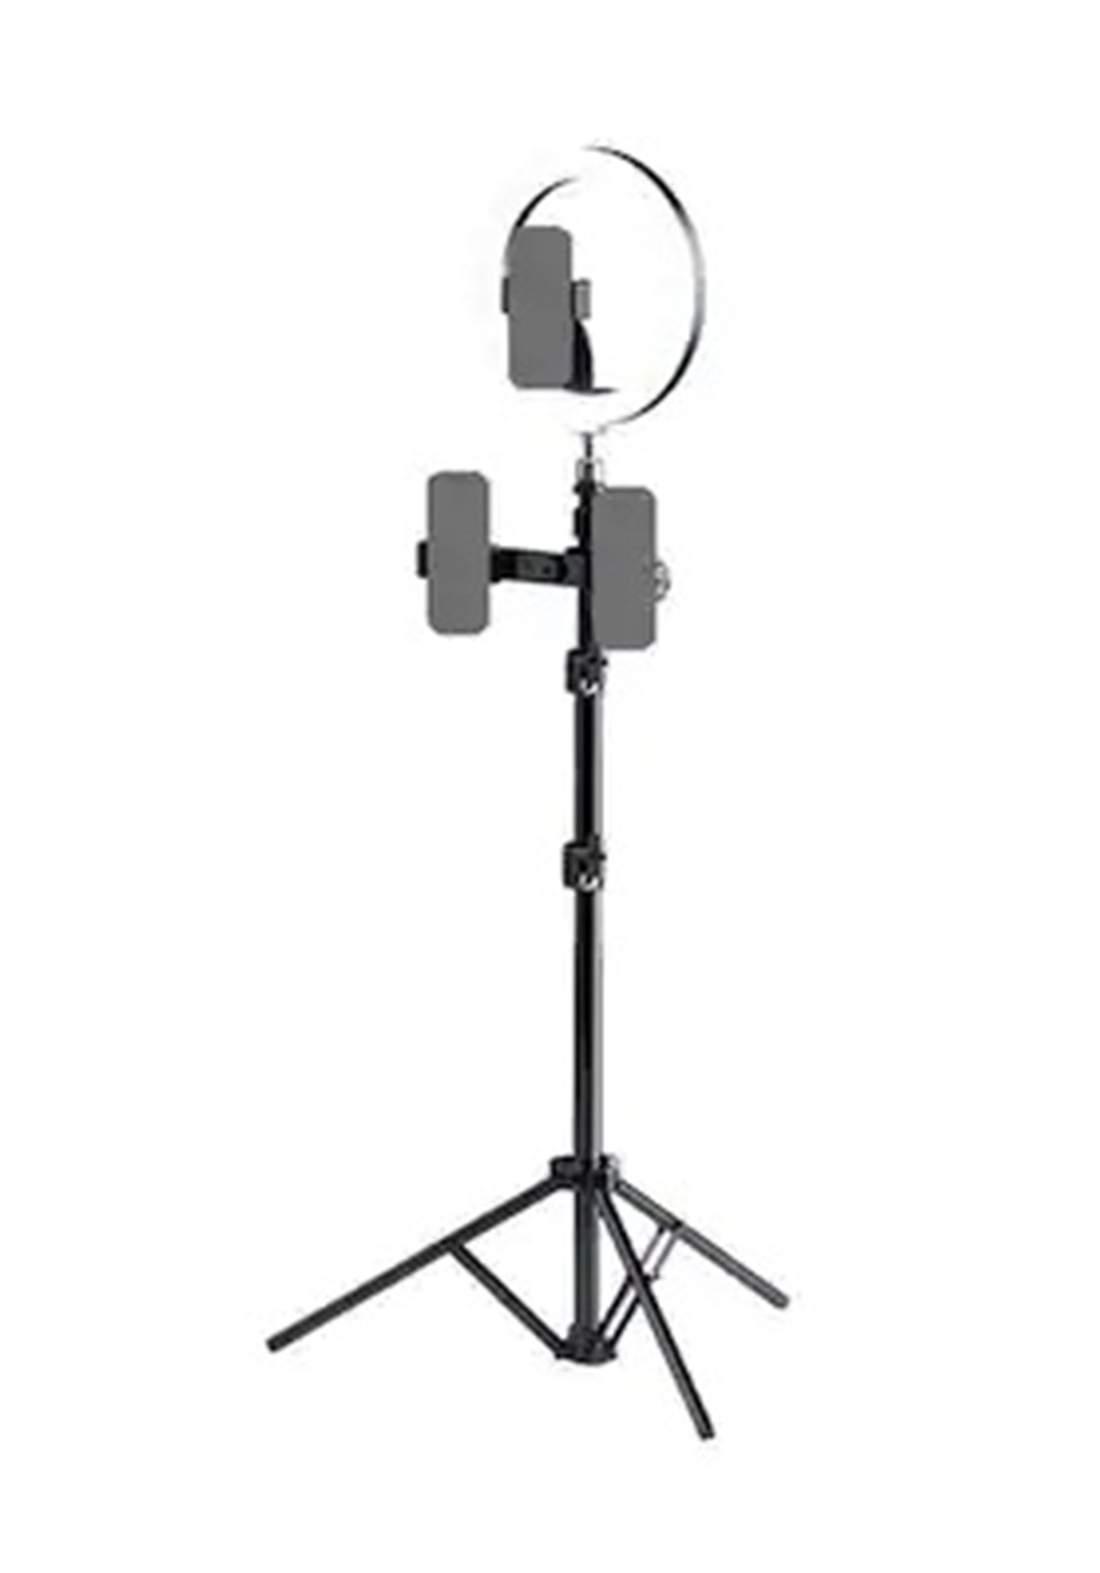 Rock Selfie Ring Light with Tripod Stand & Phone Holder Multi-camera ( RPH0948)- Black